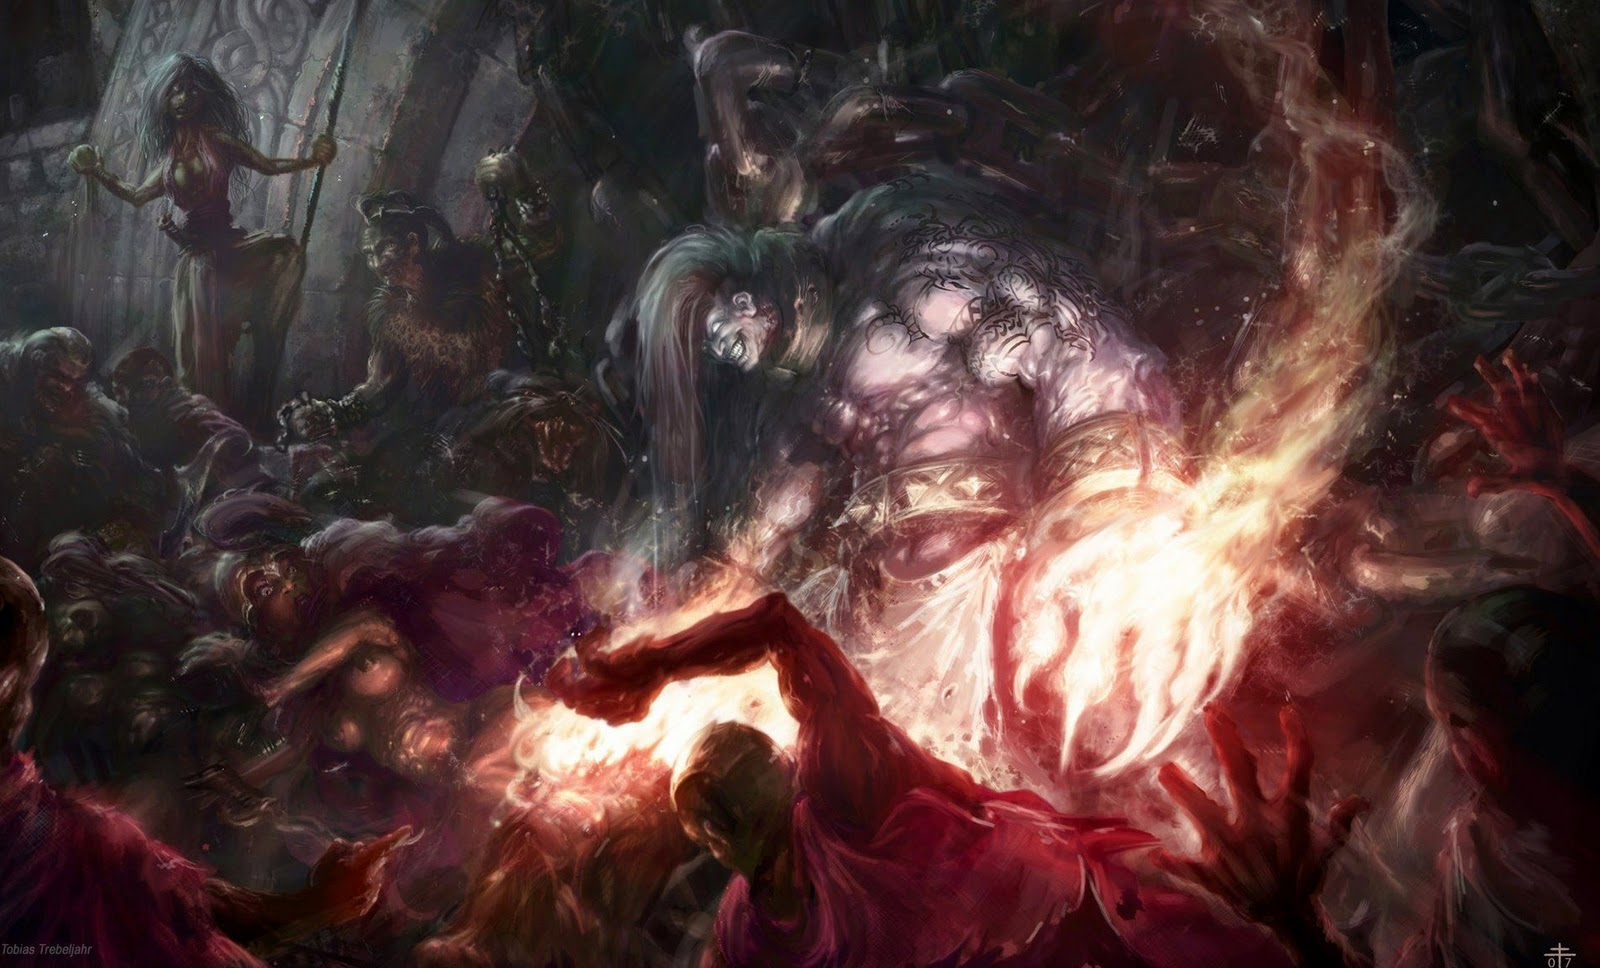 http://2.bp.blogspot.com/-YL0elyB3sDg/TwHUe_-ygFI/AAAAAAAAbOY/JpppvQ2oKyU/s1600/Deadly+Fantasy+HD+Wallpapers+%252836%2529.jpg